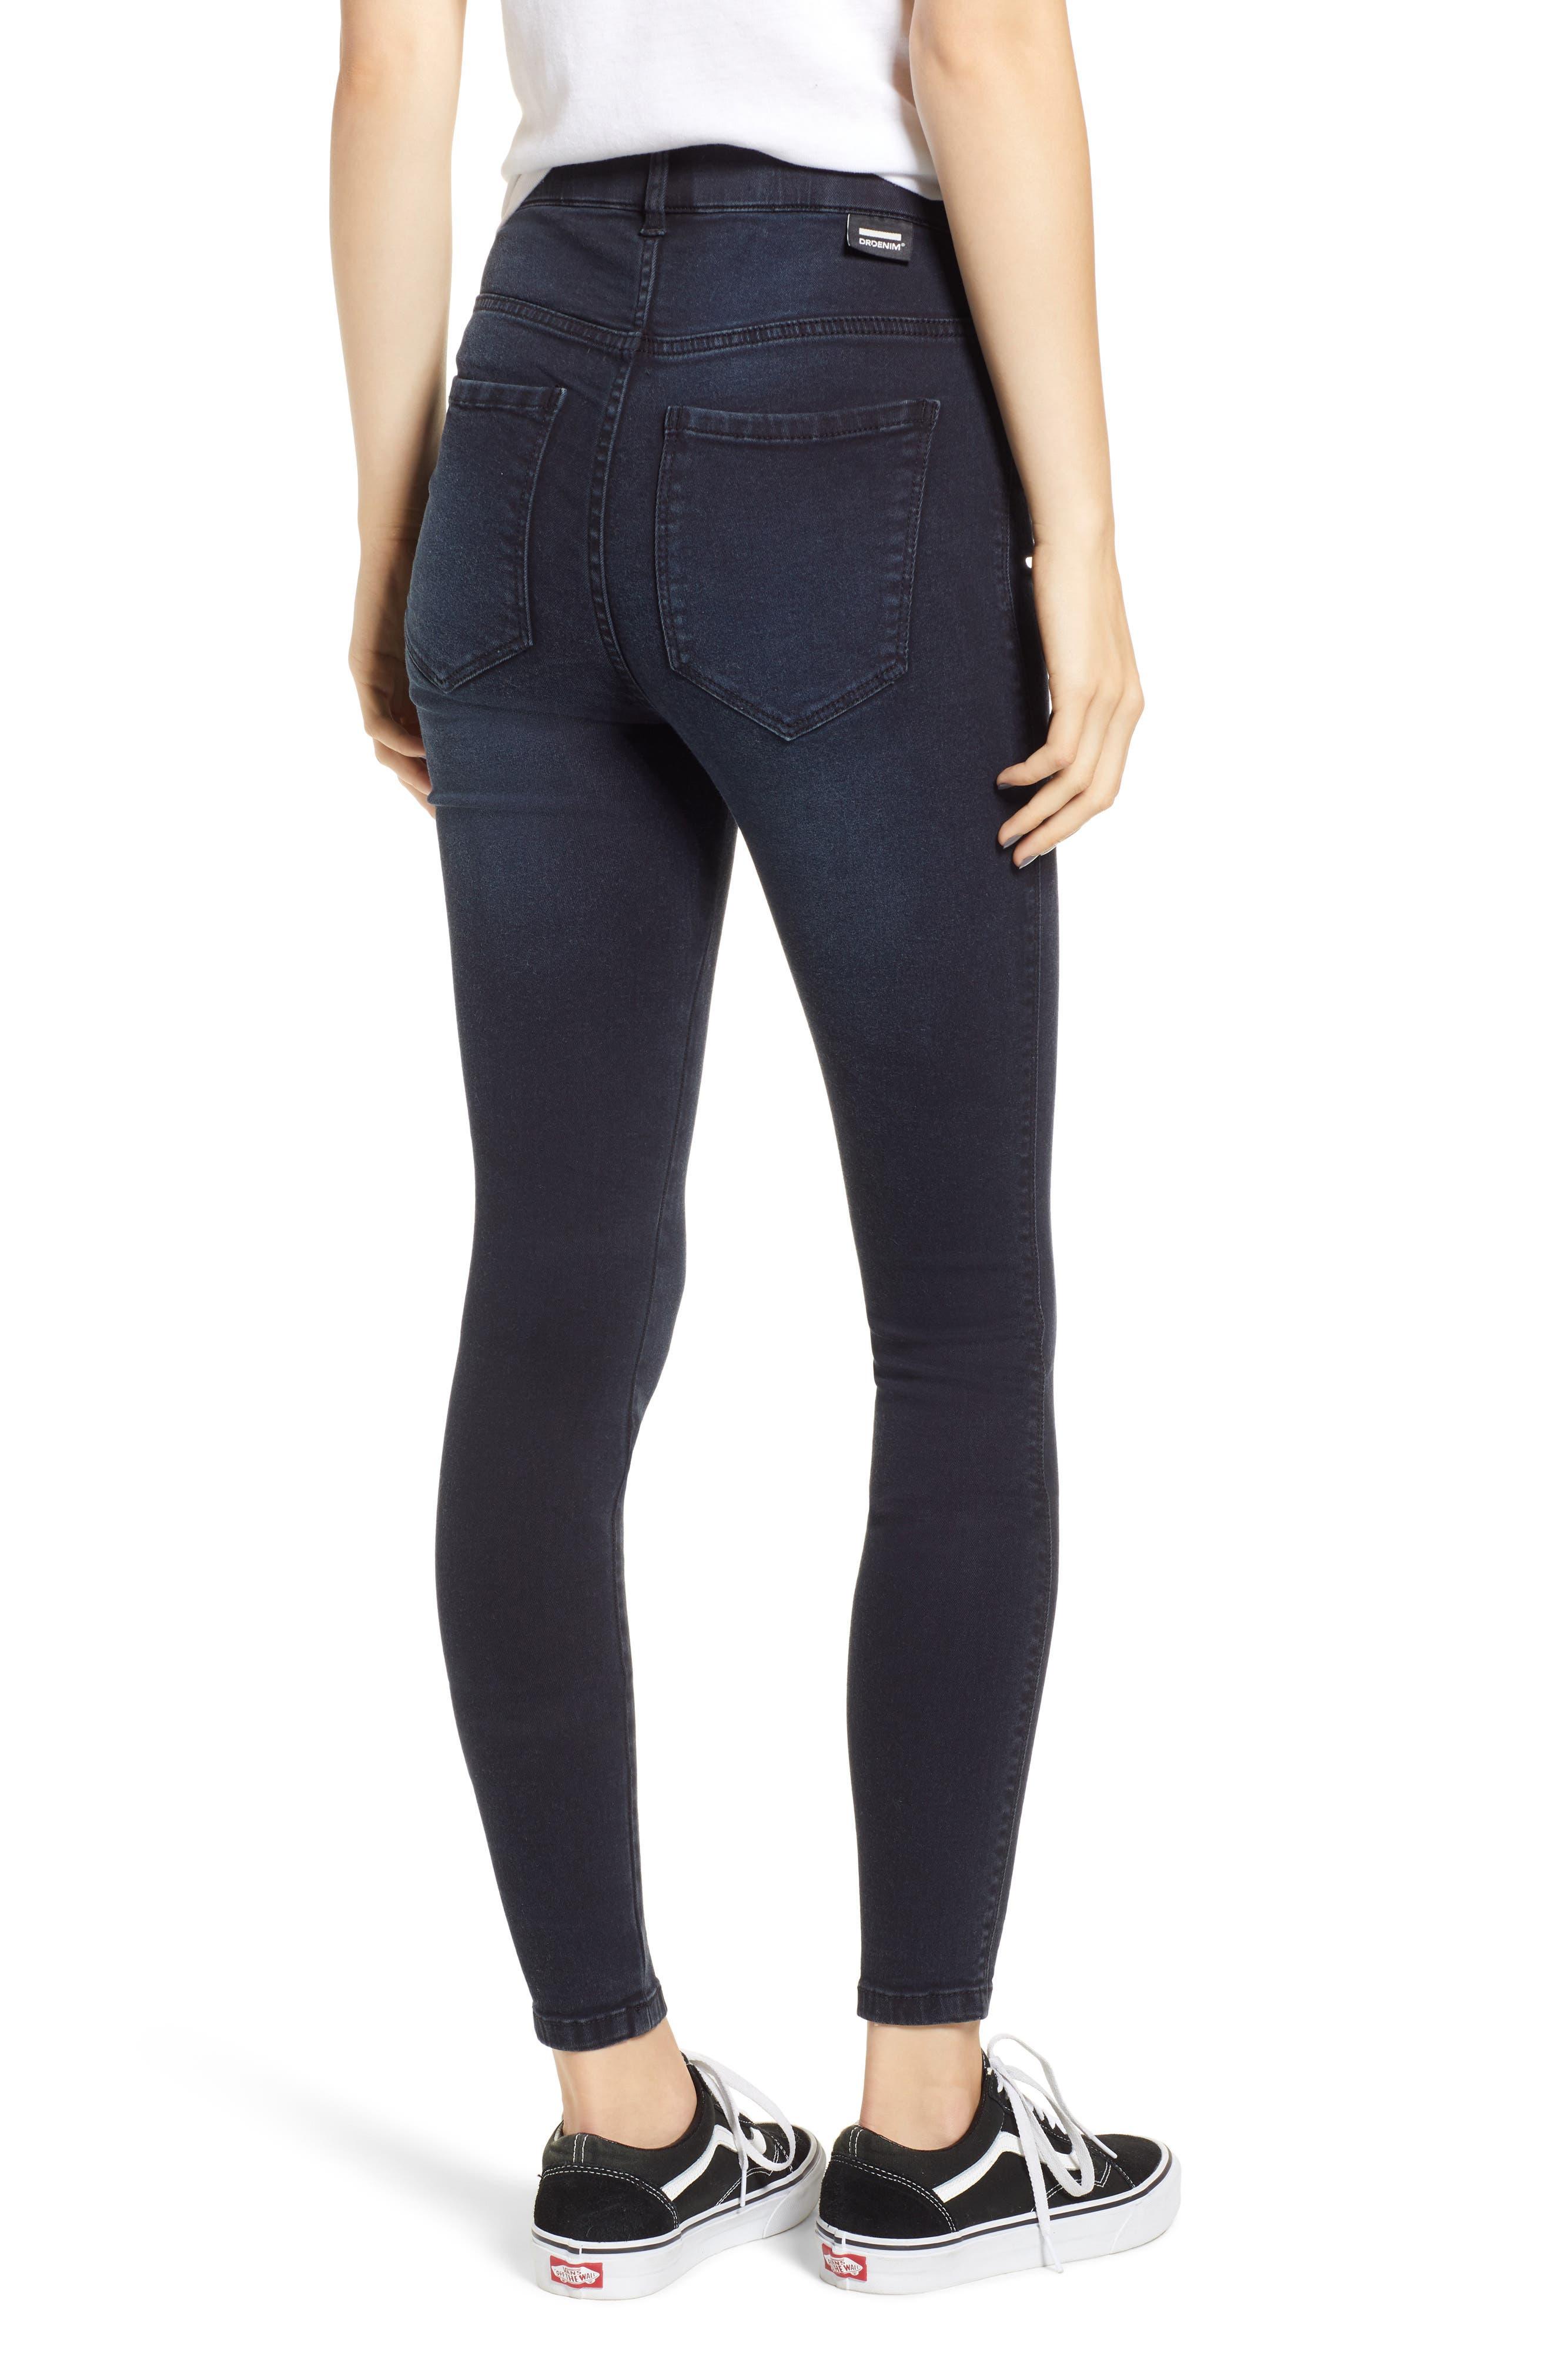 Moxy Skinny Jeans,                             Alternate thumbnail 2, color,                             PITCH DARK BLUE